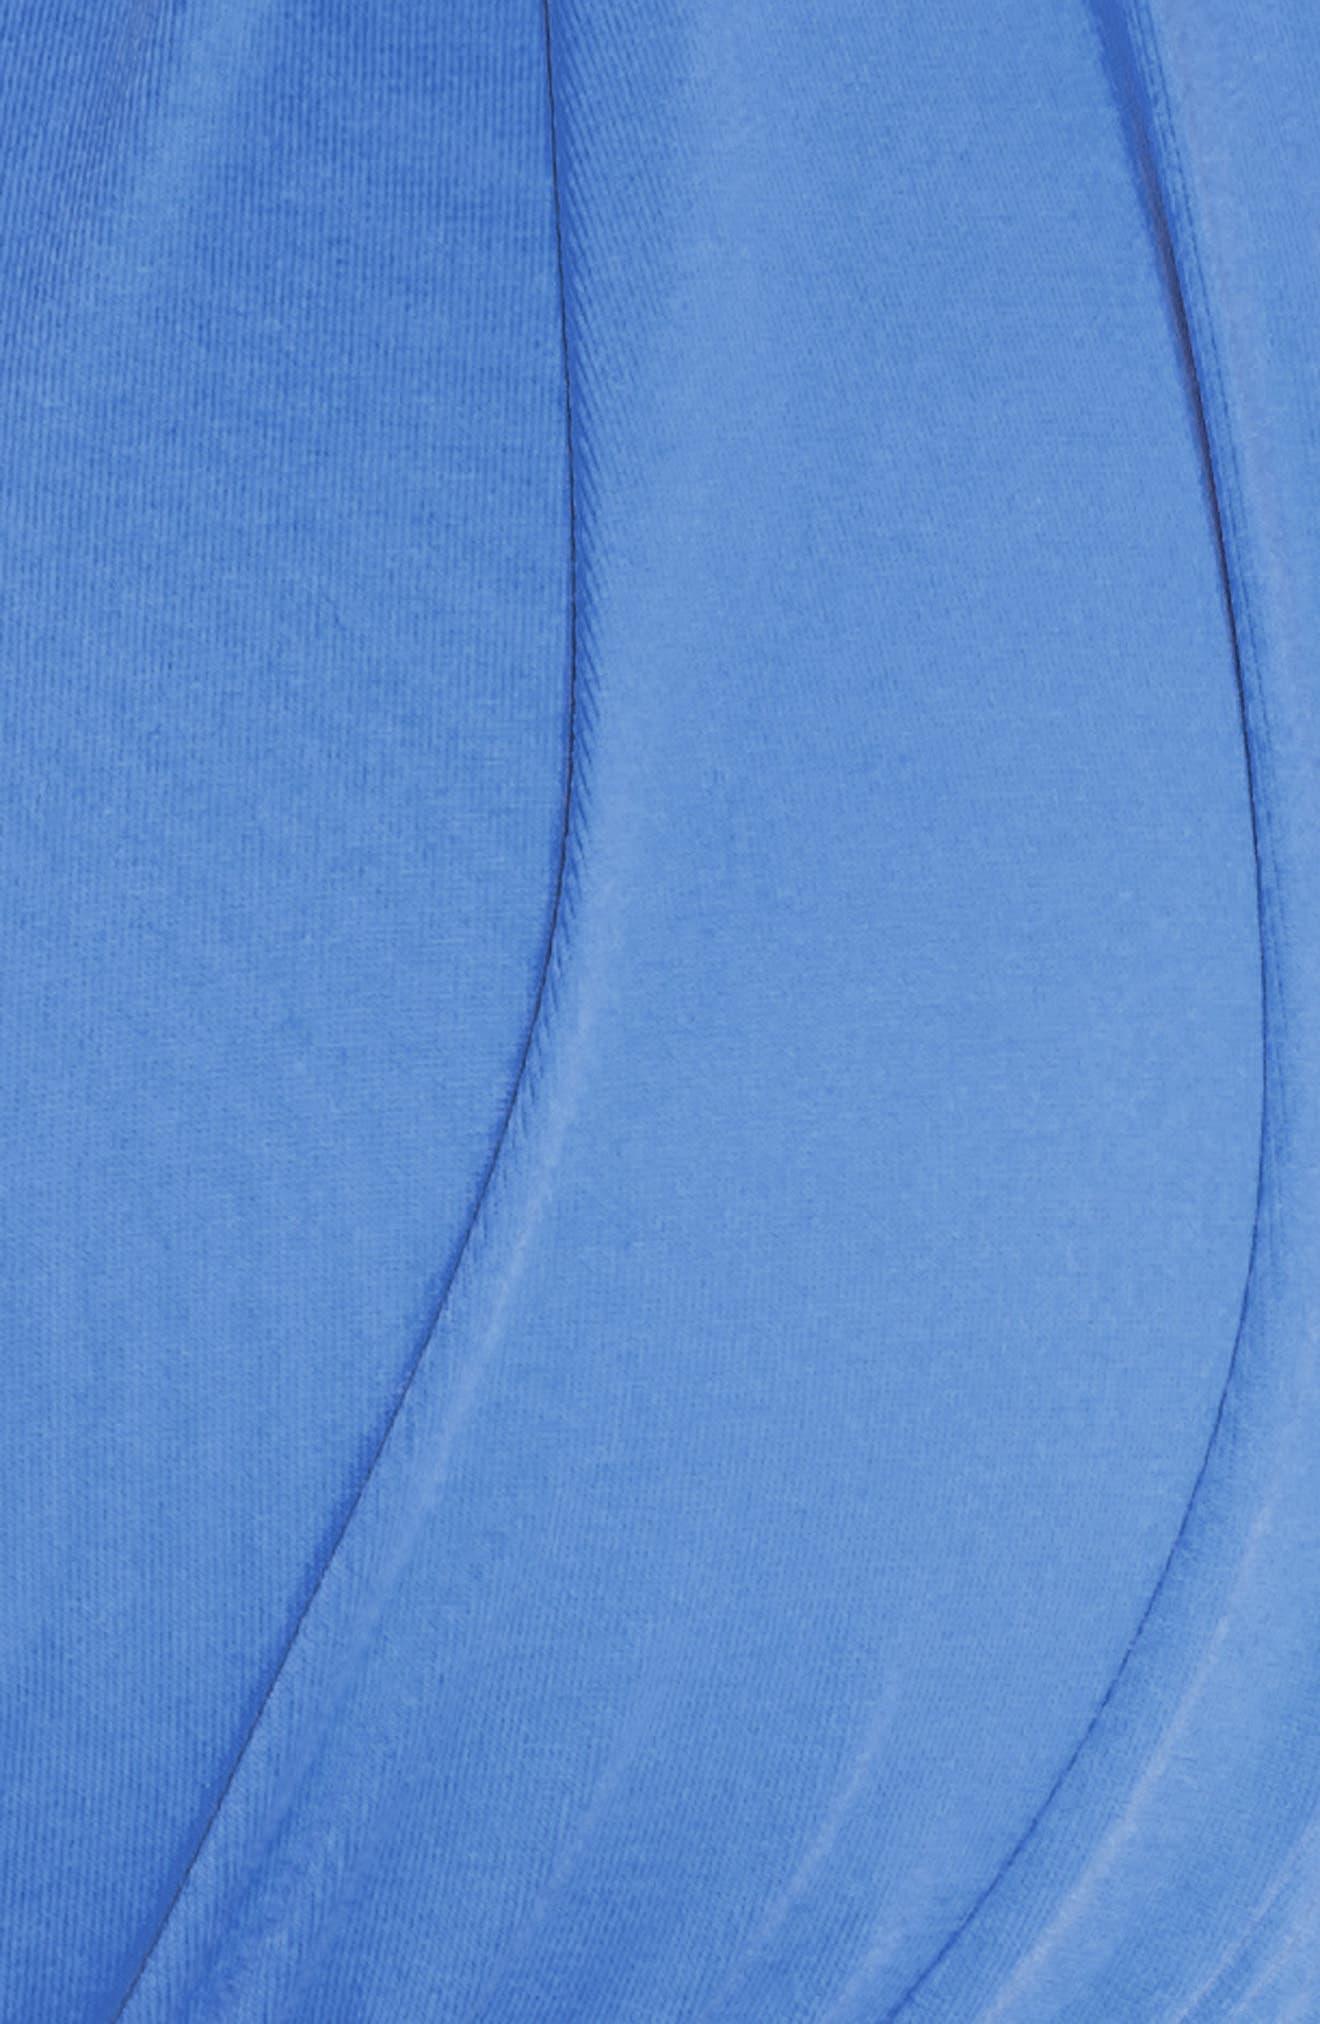 Island Blanca Halter Bikini Top,                             Alternate thumbnail 5, color,                             Blue Suede